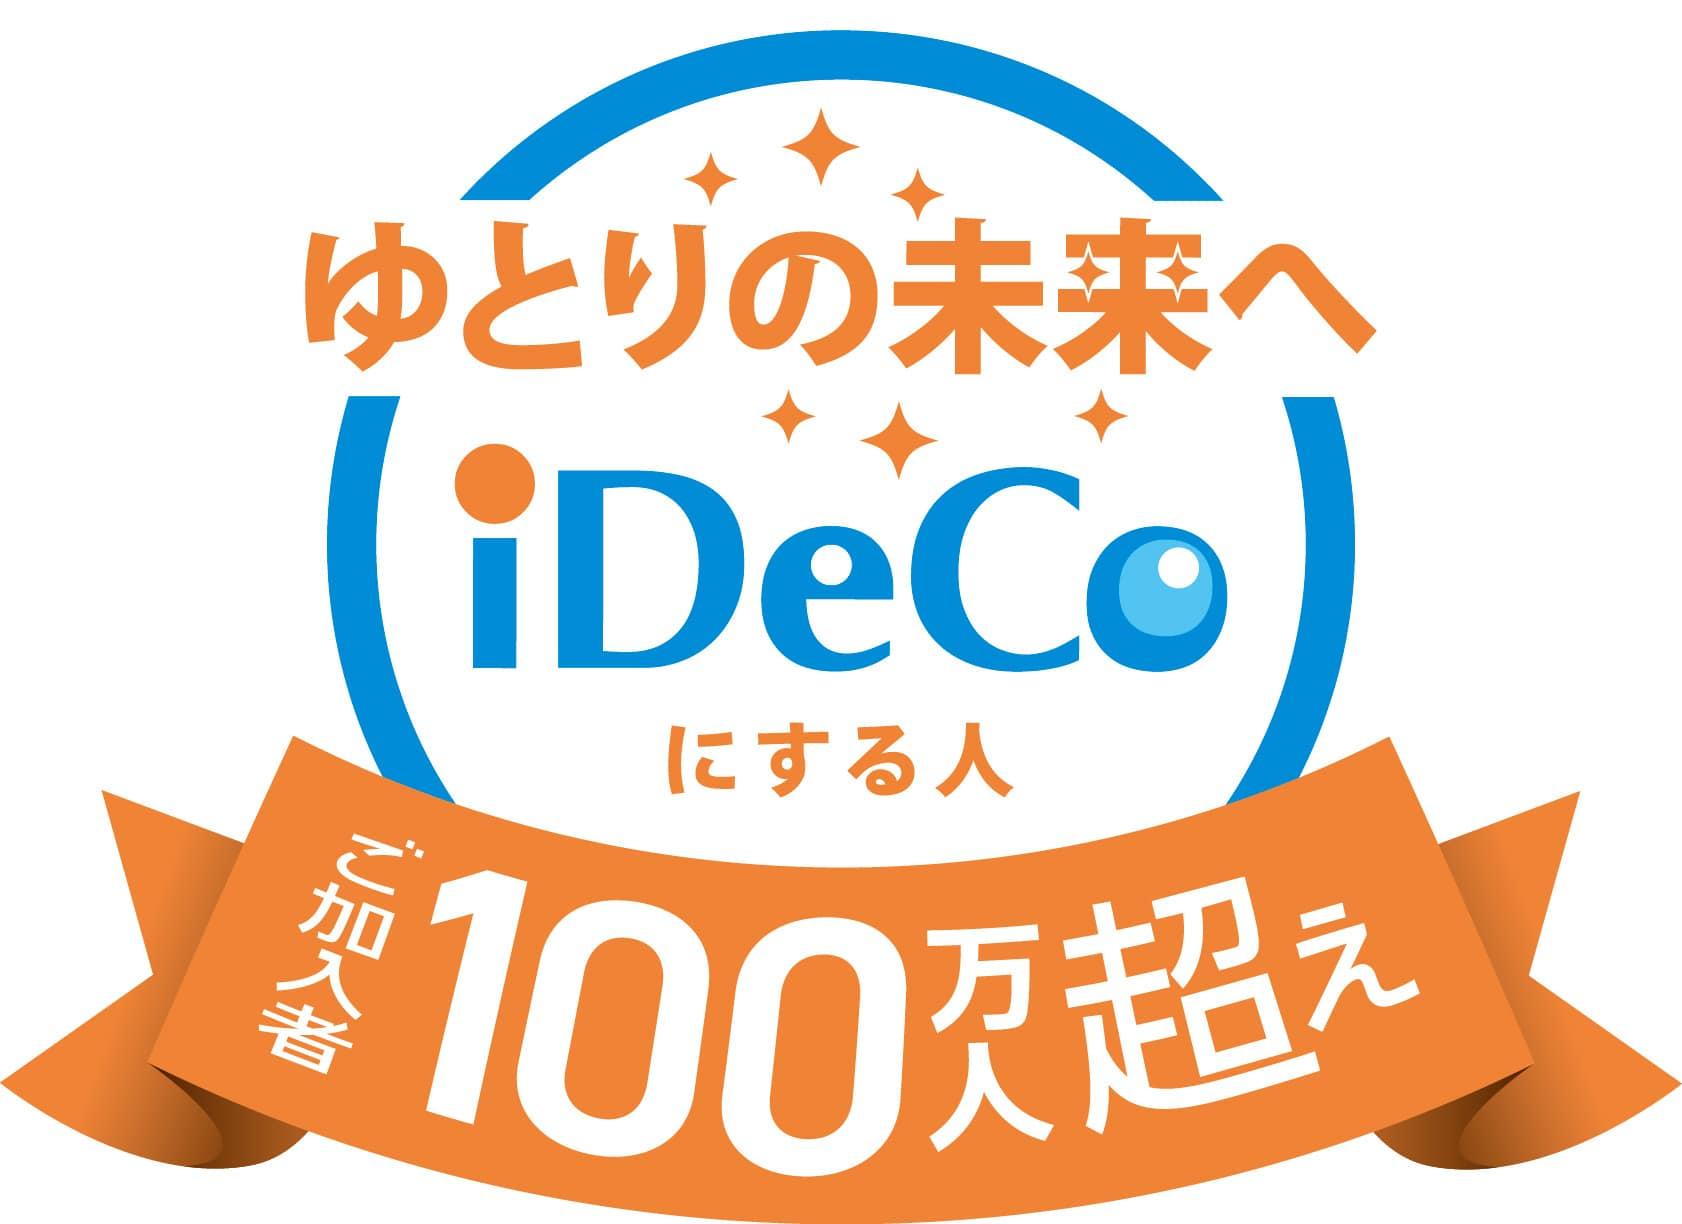 iDeCo100万人突破ロゴ